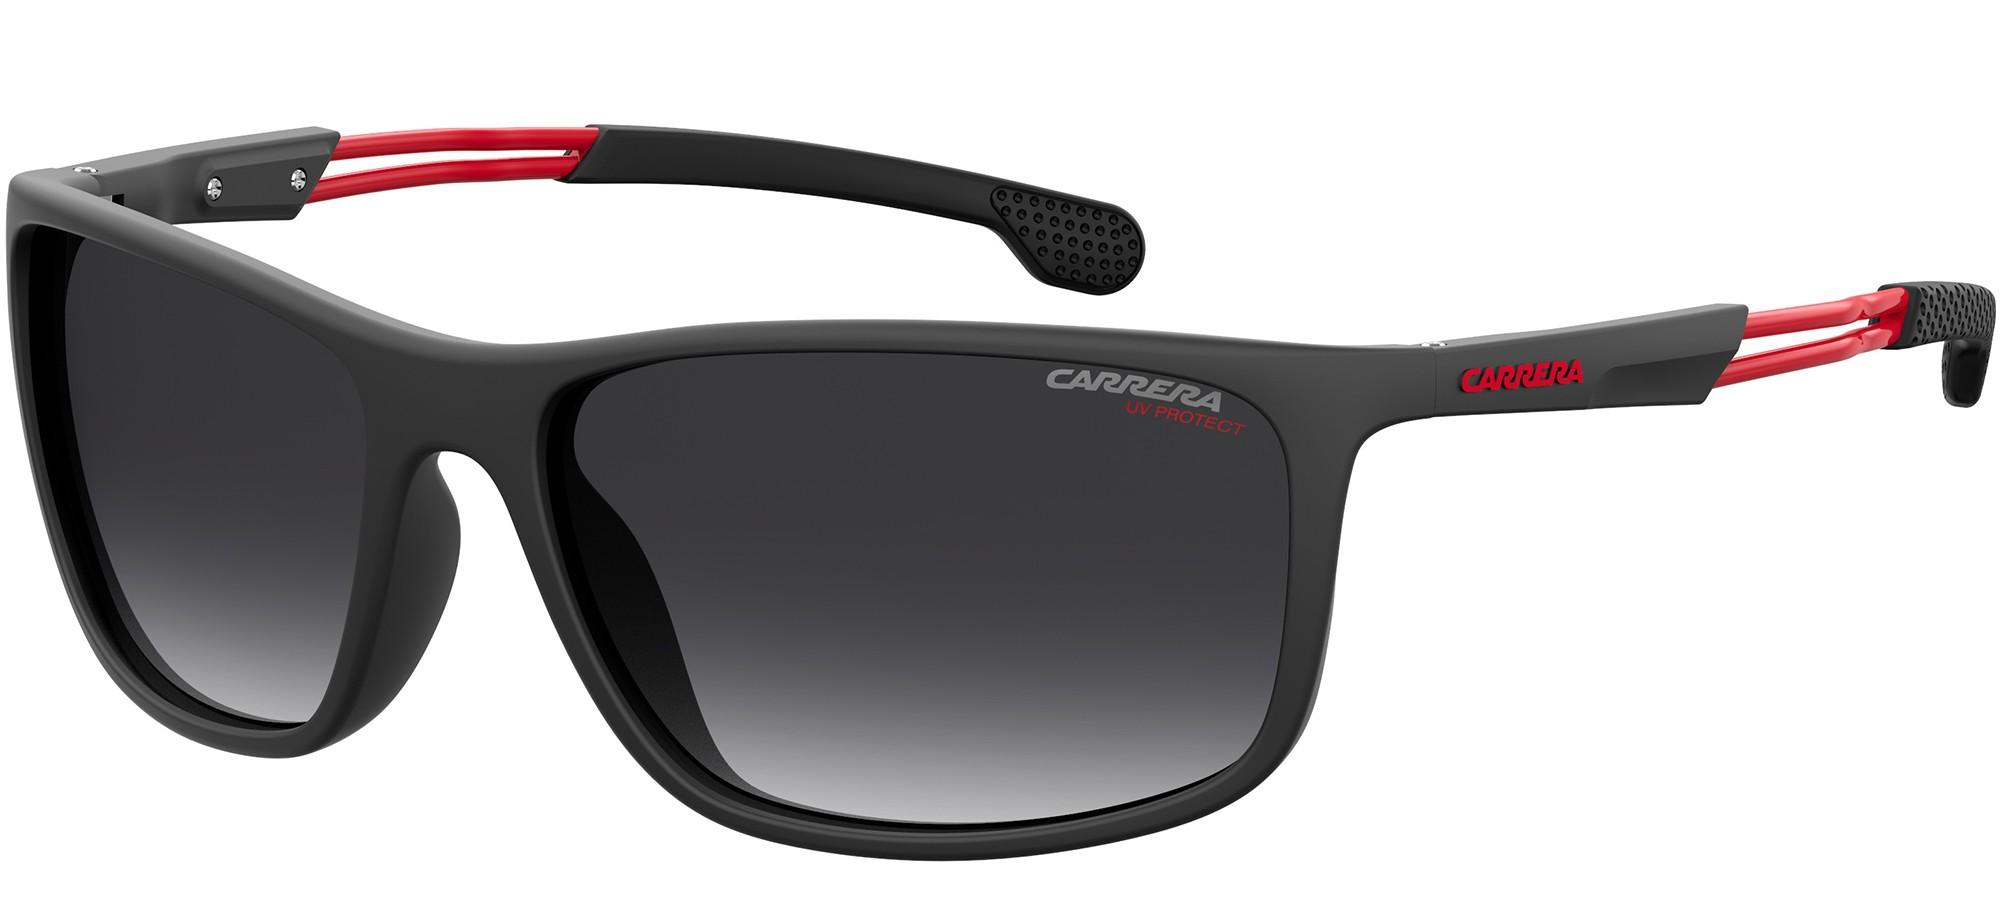 Carrera sunglasses CARRERA 4013/S